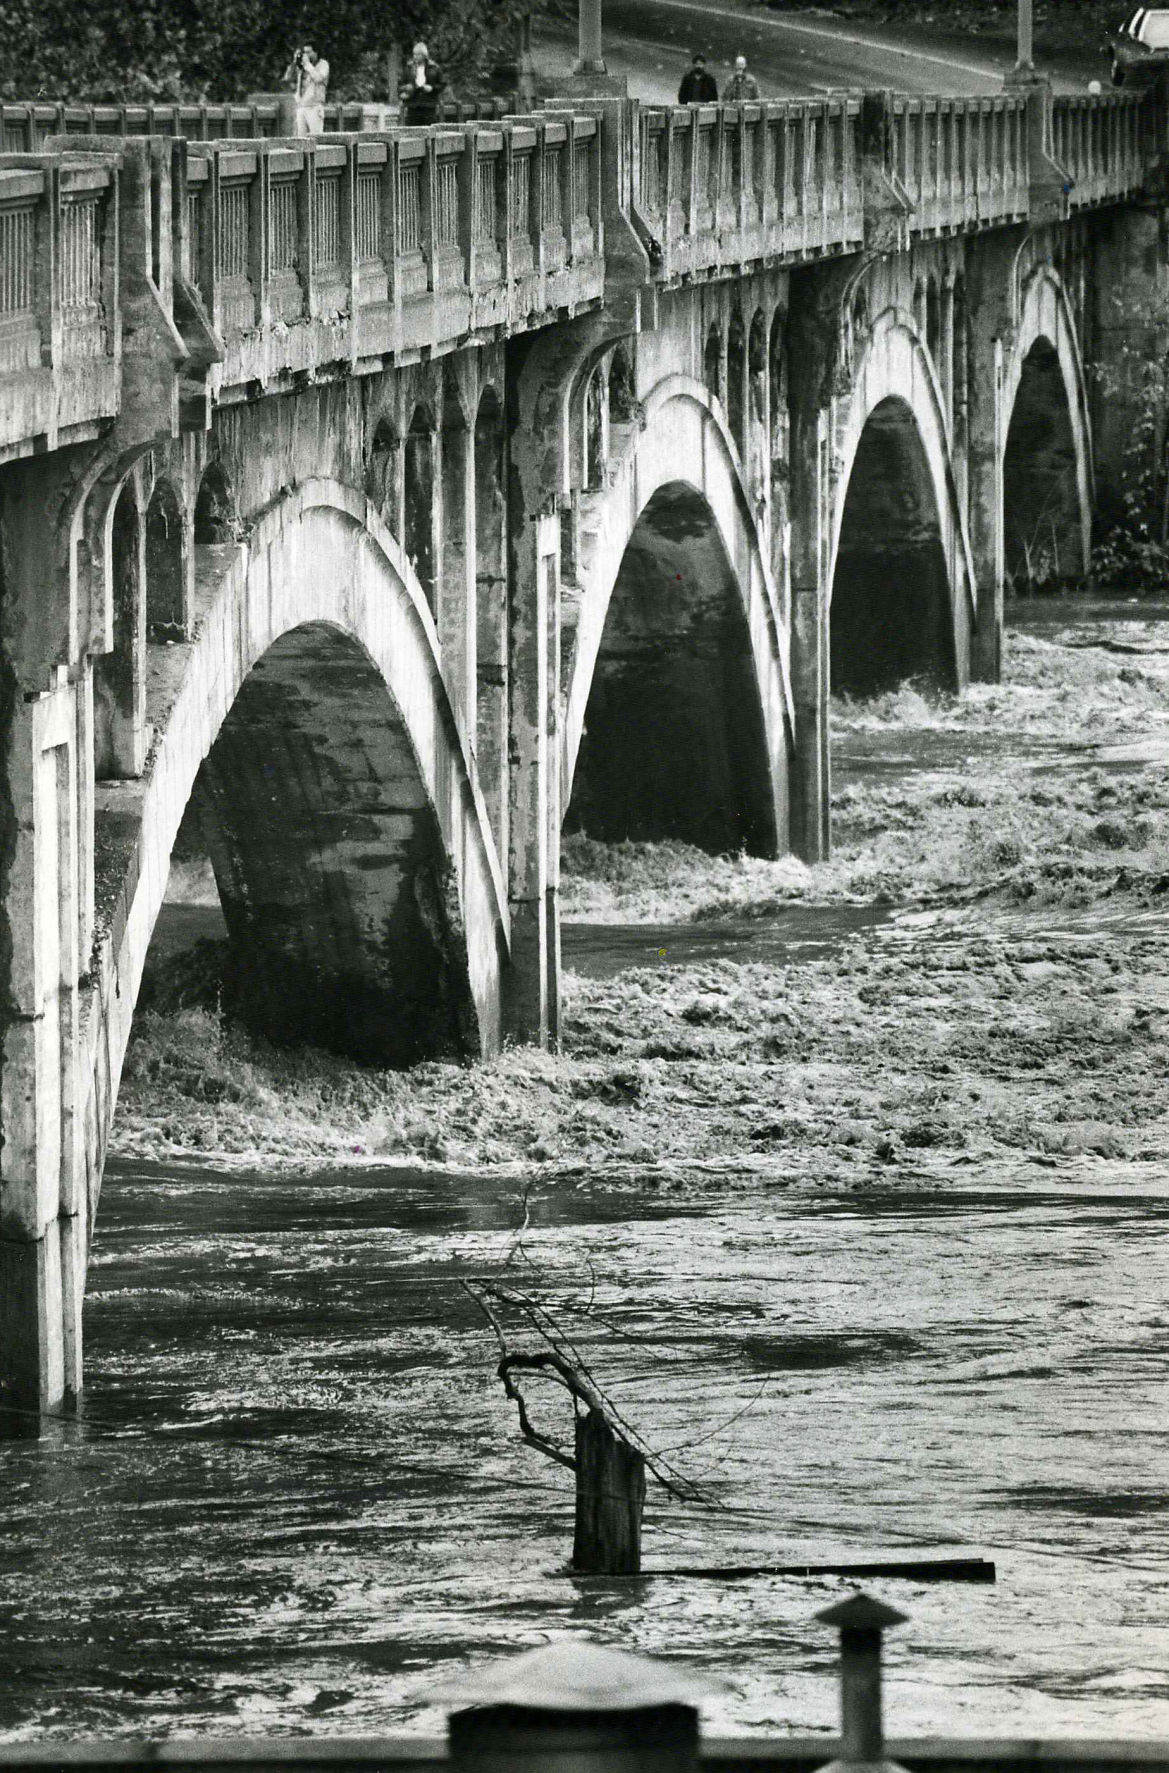 1985-11-05 Flood of 1985 - 9